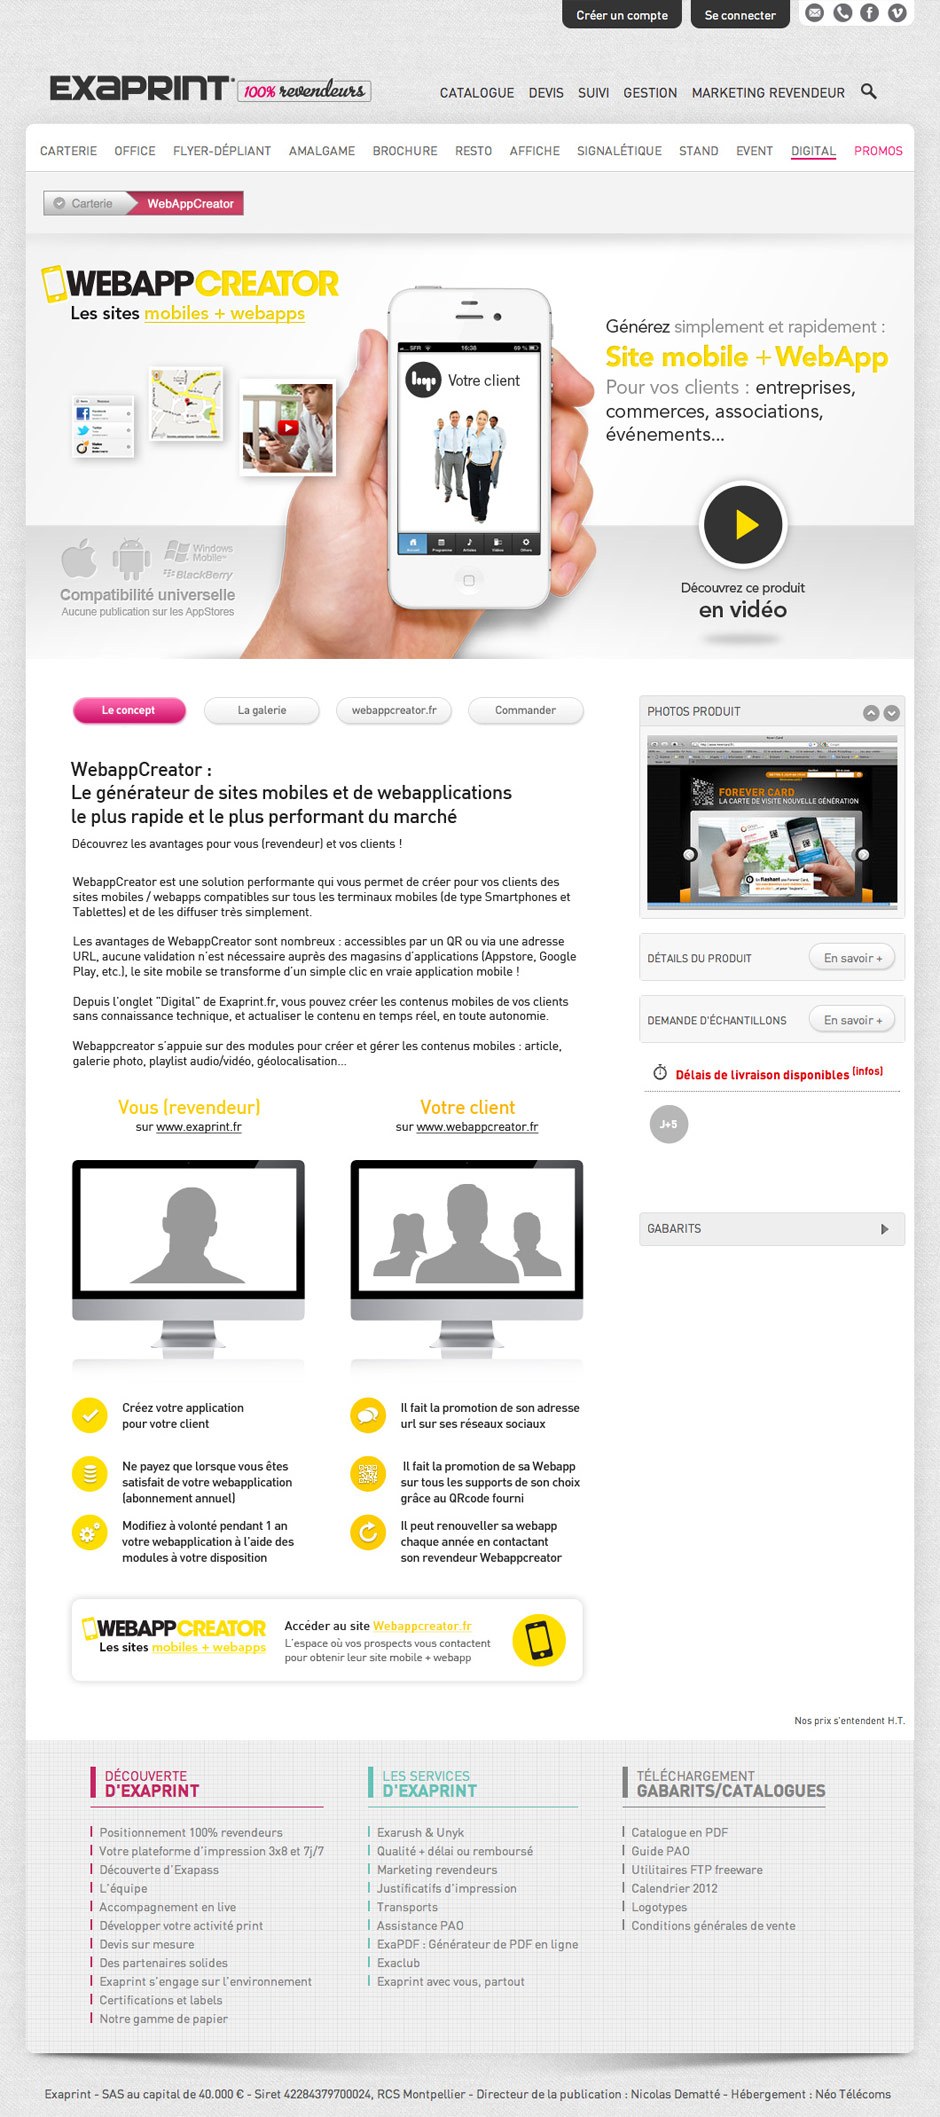 graphiste-montpellier-creation-exaprint-webappcreator-agence-communication-montpellier-caconcept-alexis-cretin-2